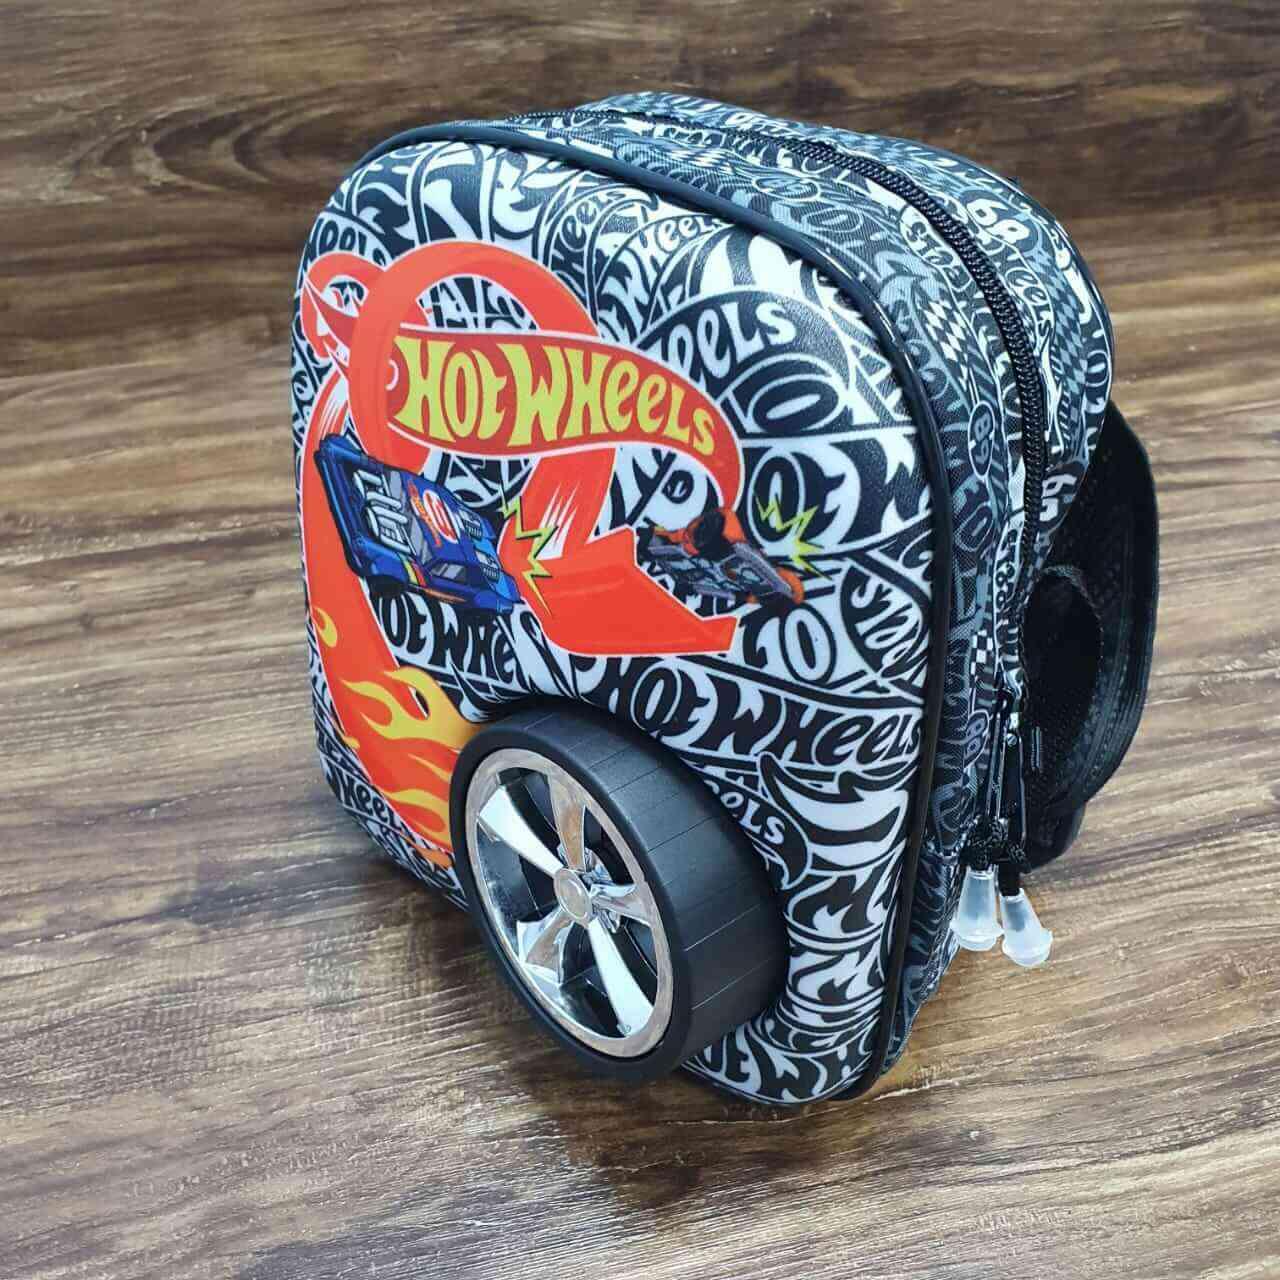 Mochila de Rodinhase com Lancheira Hot Wheels Terrian Storm Infantil